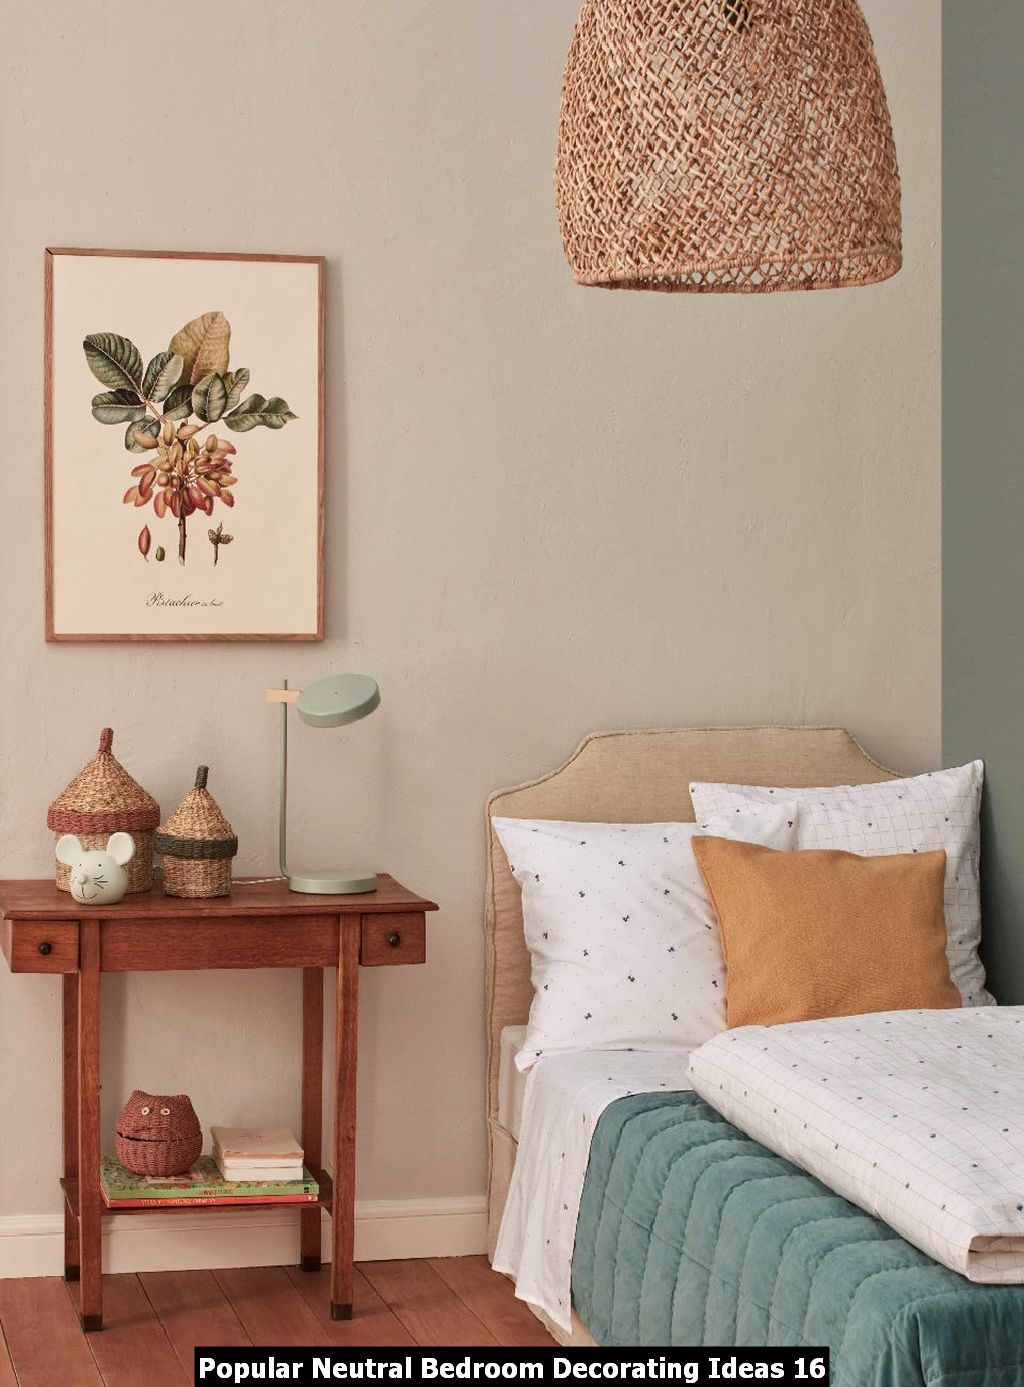 Popular Neutral Bedroom Decorating Ideas 16